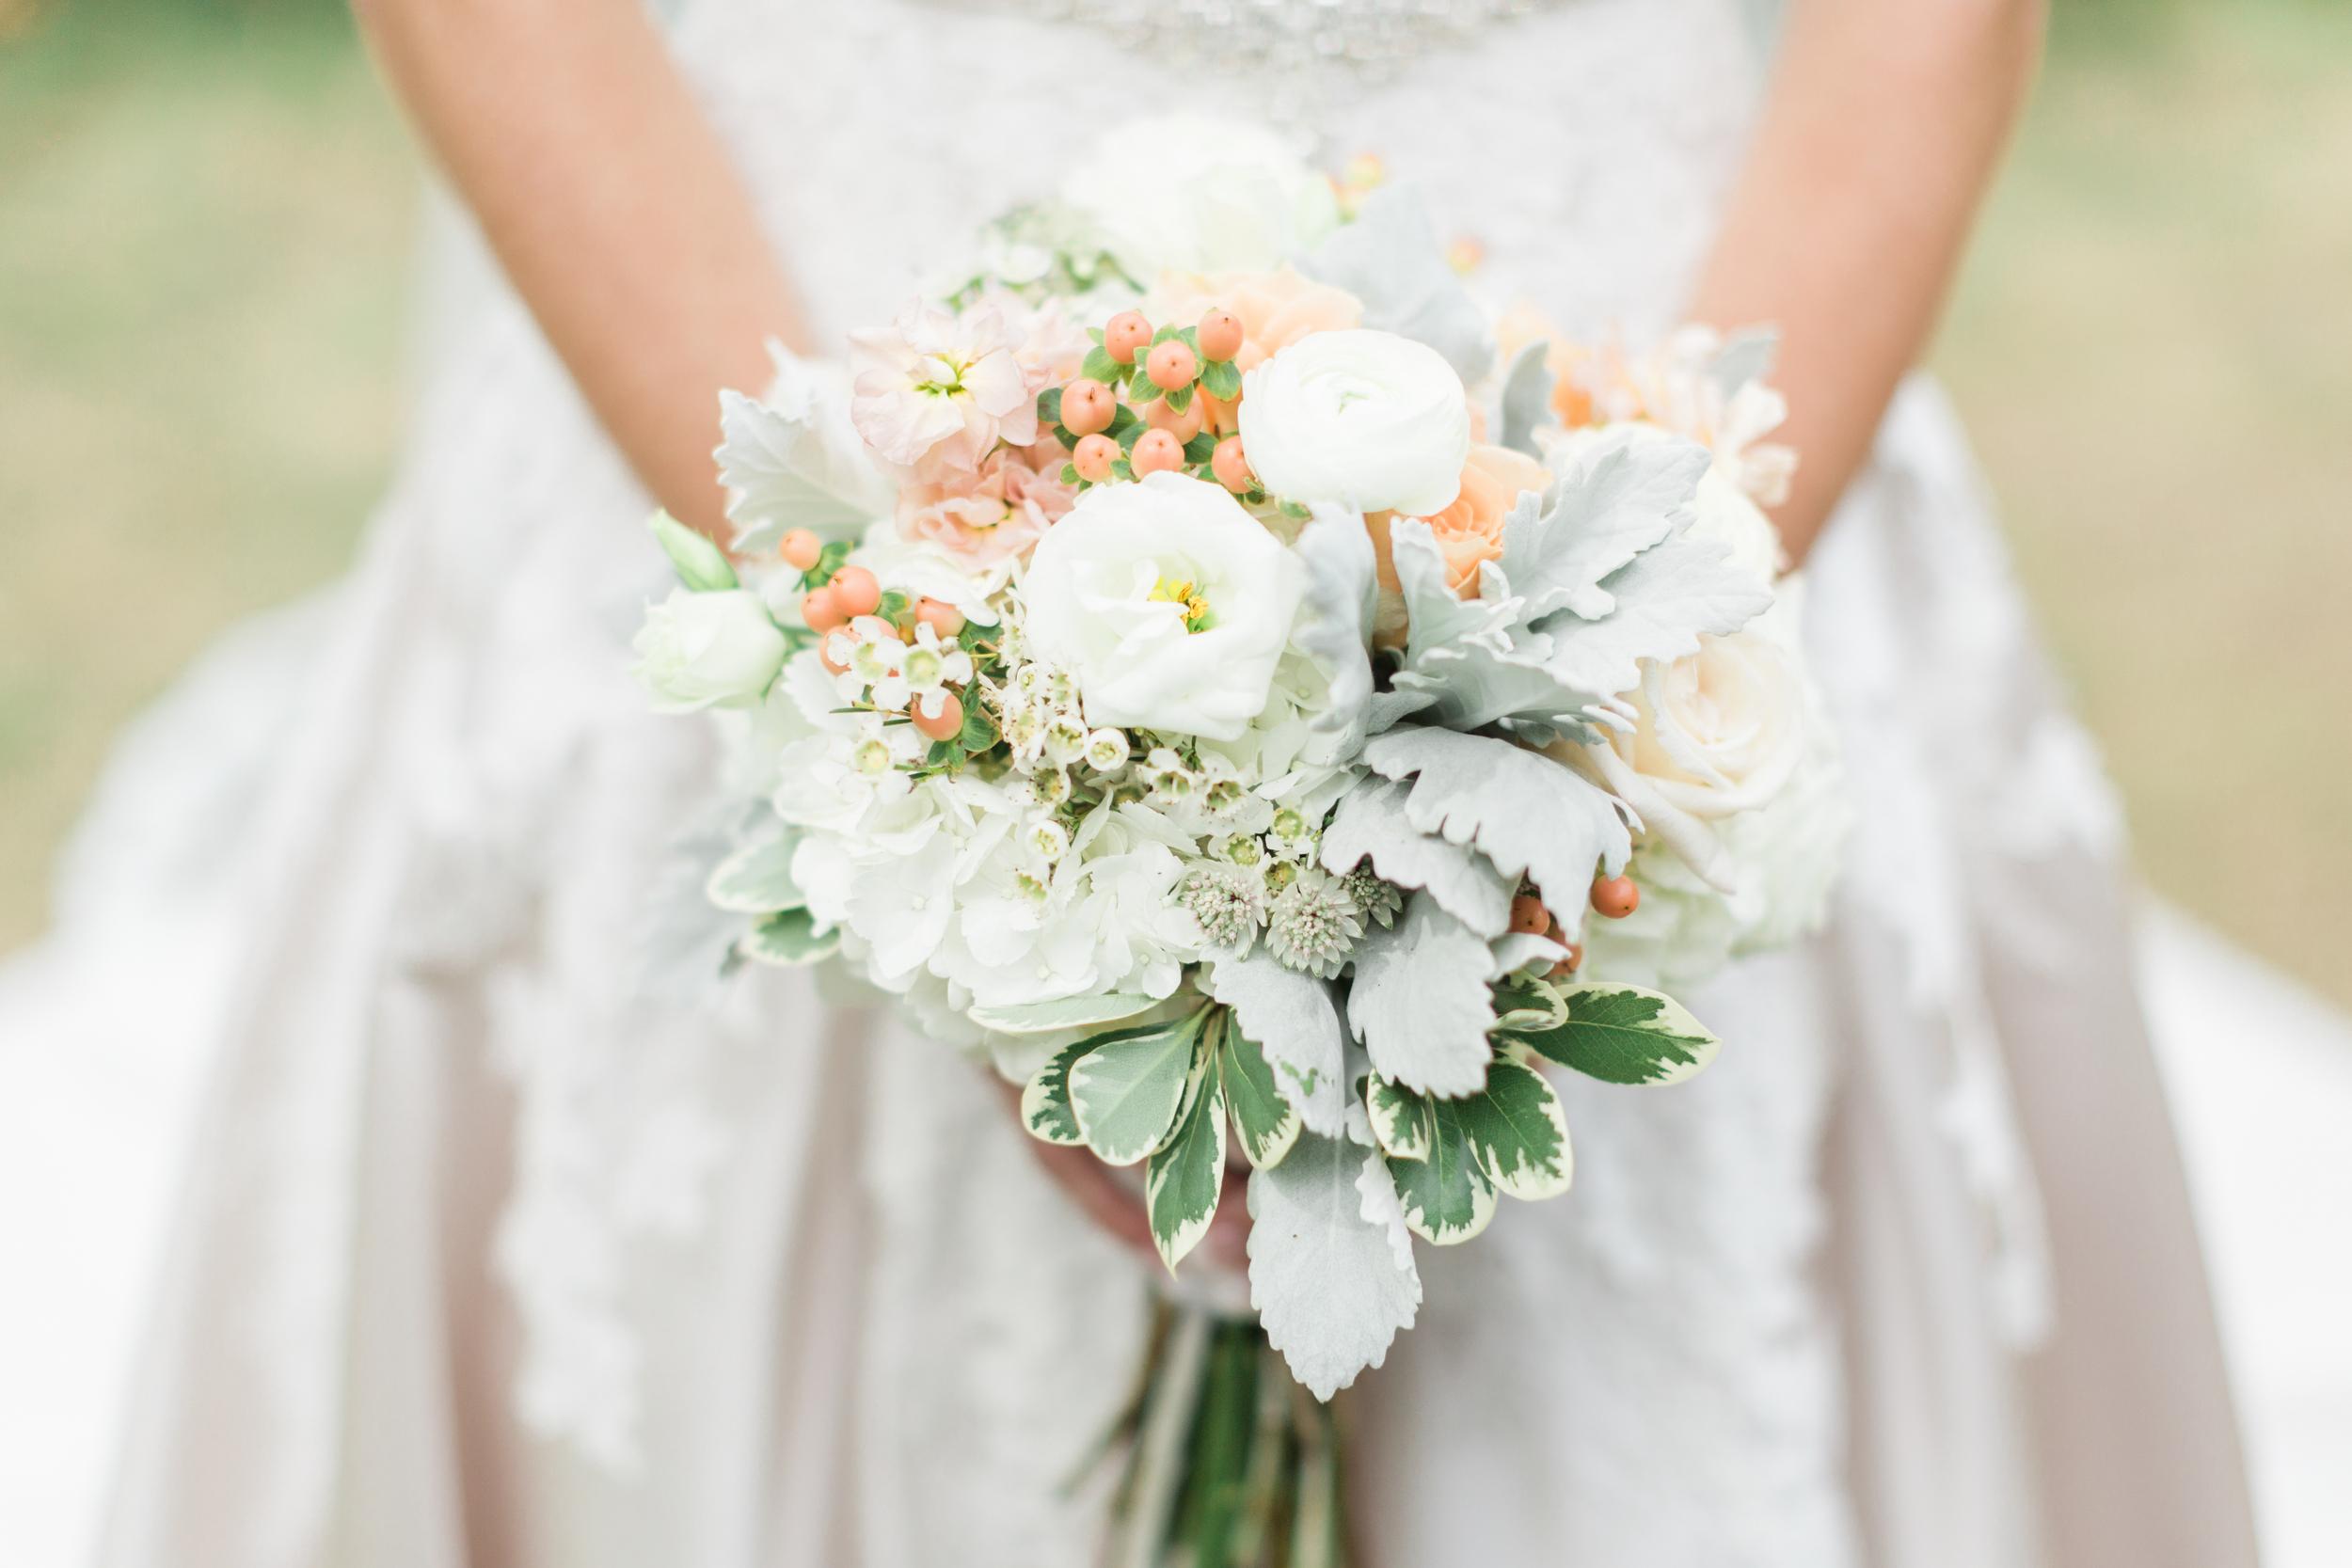 Brewbaker-Wedding-Montgomery-Alabama-Nick-Drollette-106.jpg